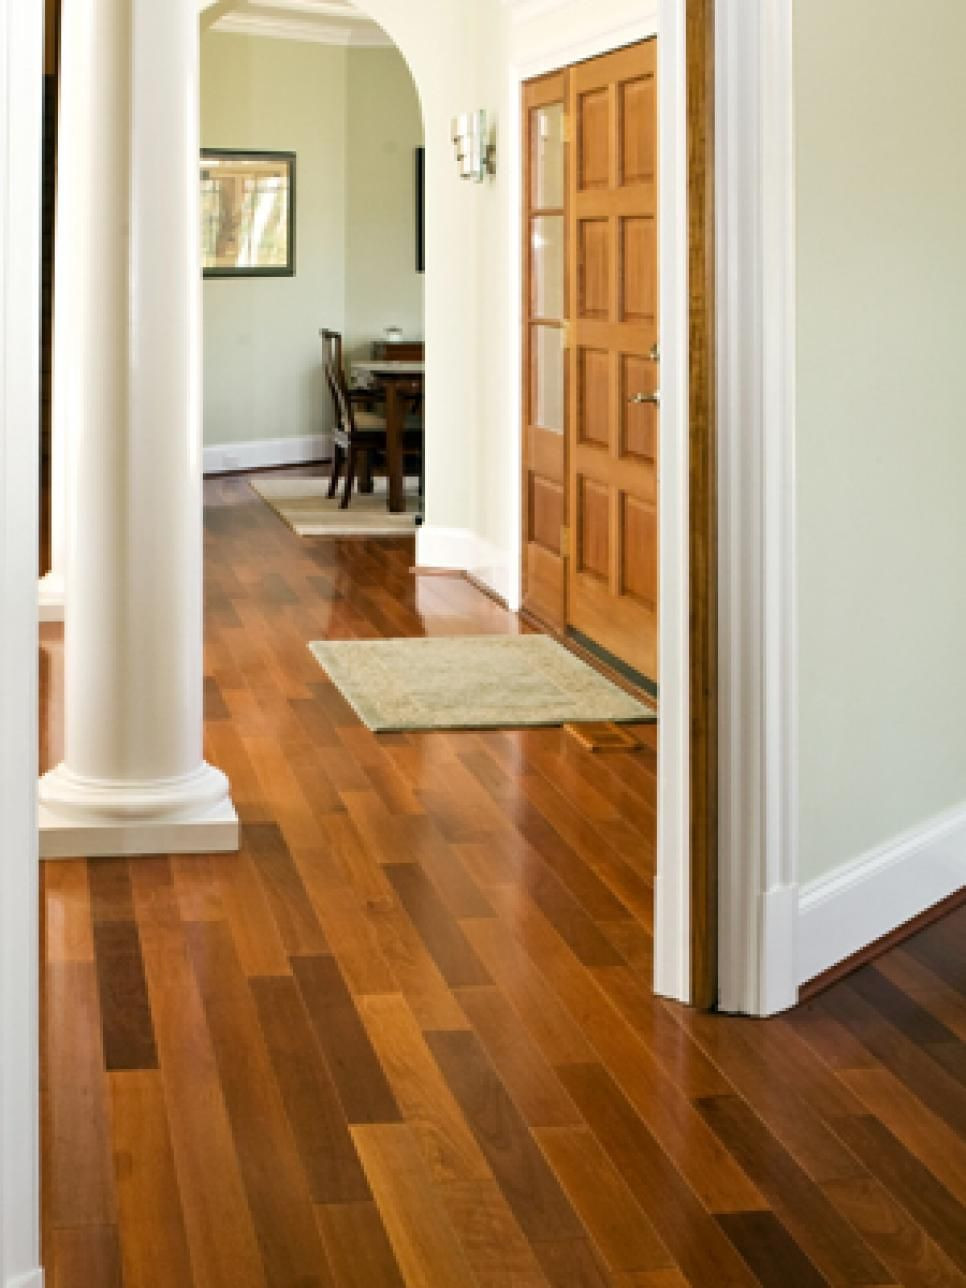 somerset white oak hardwood flooring of 10 stunning hardwood flooring options interior design styles and throughout 10 stunning hardwood flooring options interior design styles and color schemes for home decorating